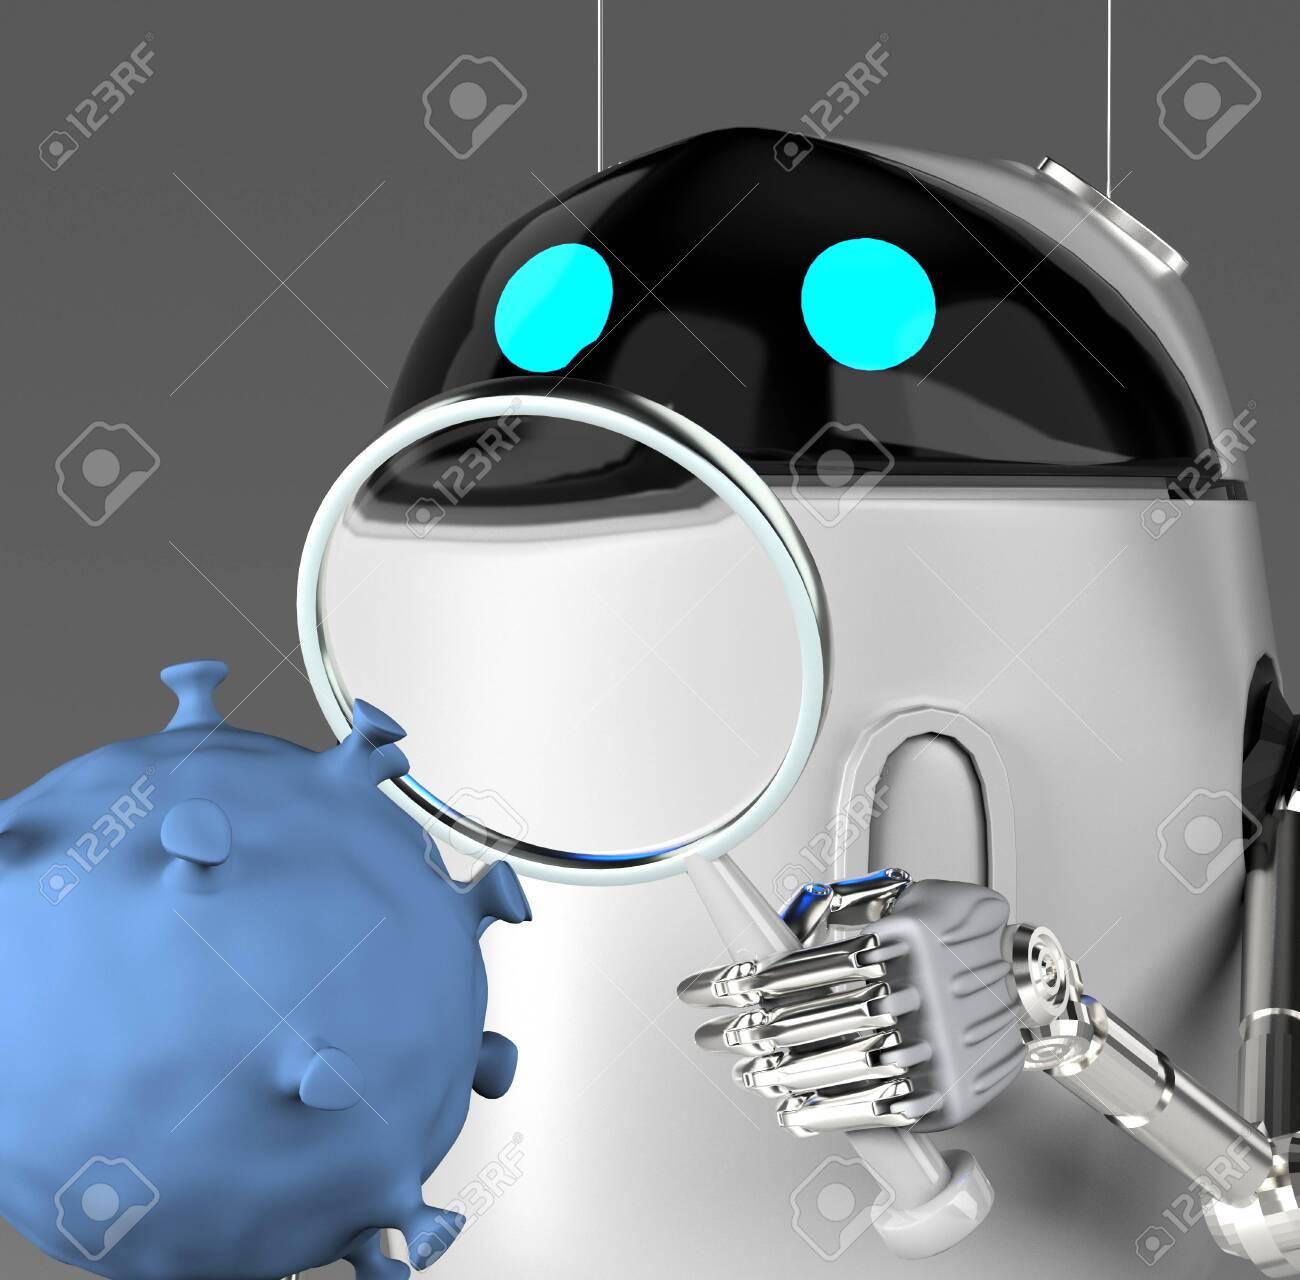 The robot studies a coronavirus with magnifier,robot with bacterium,3d render. - 141047812